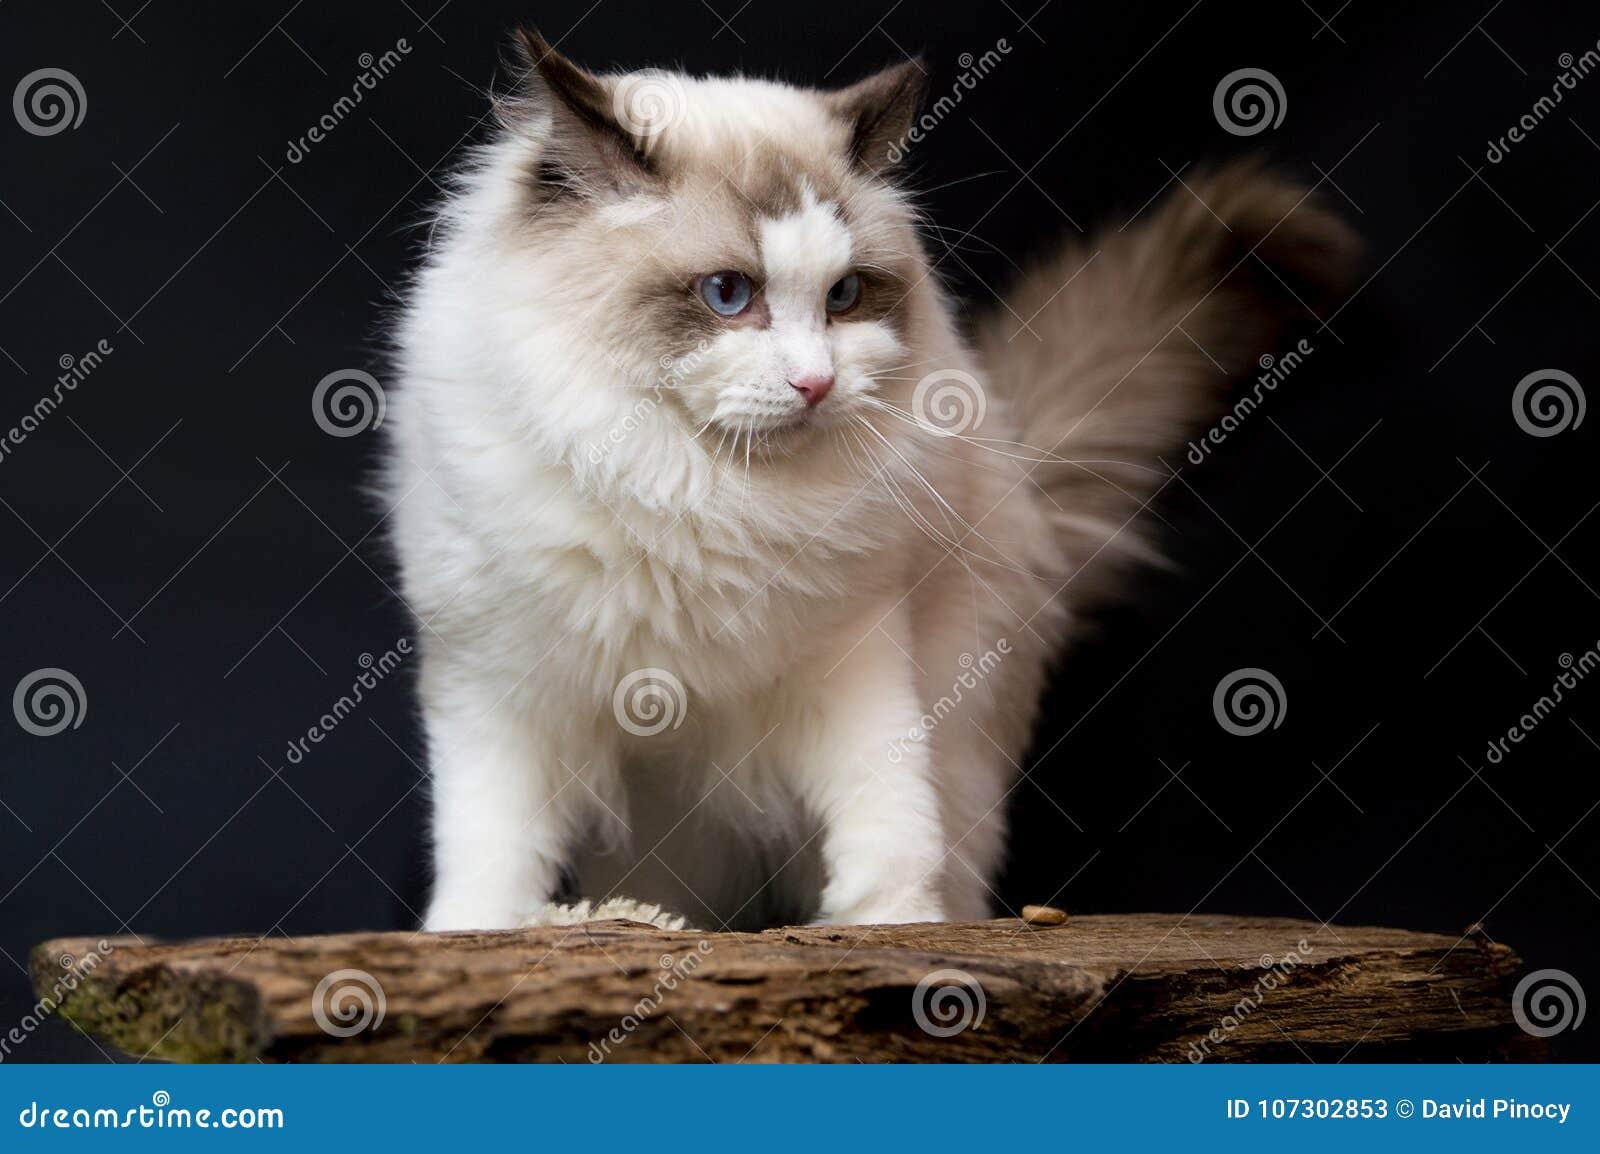 Ragdoll white very beauty cat